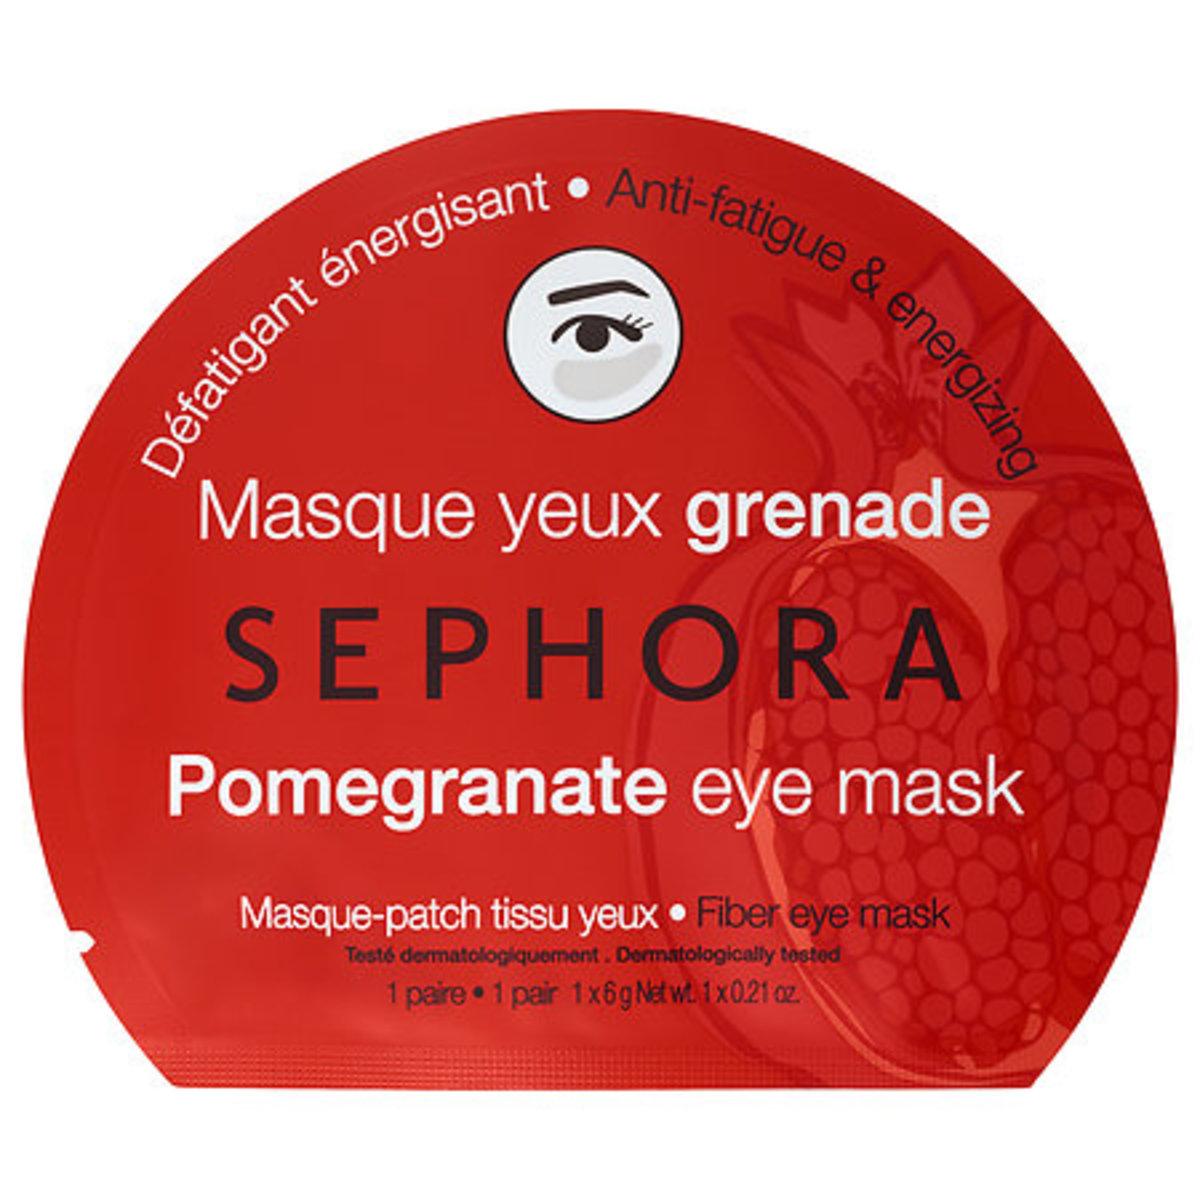 Sephora Pomegranate Eye Mask, $5, available at Sephora.